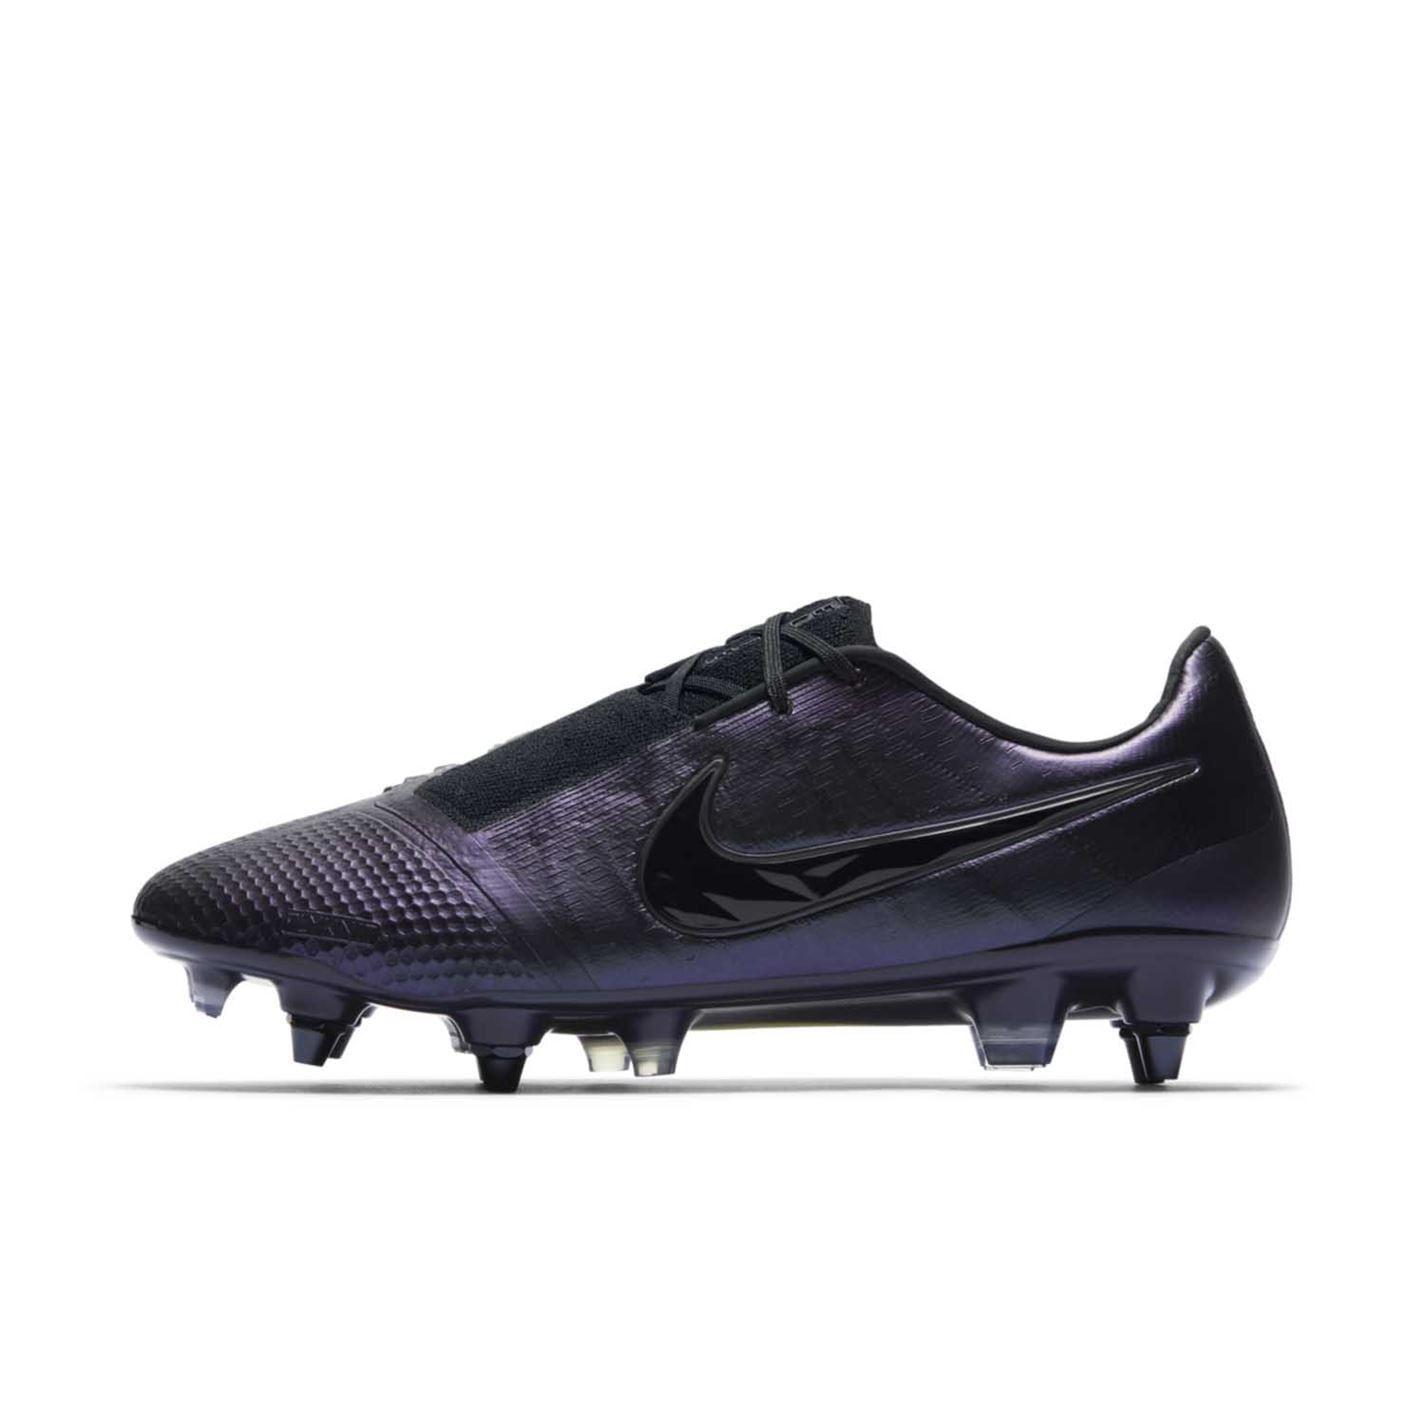 Nike-Phantom-Venom-Elite-Homme-SG-Terrain-Souple-Chaussures-De-Football-Chaussures-de-foot-crampons miniature 6